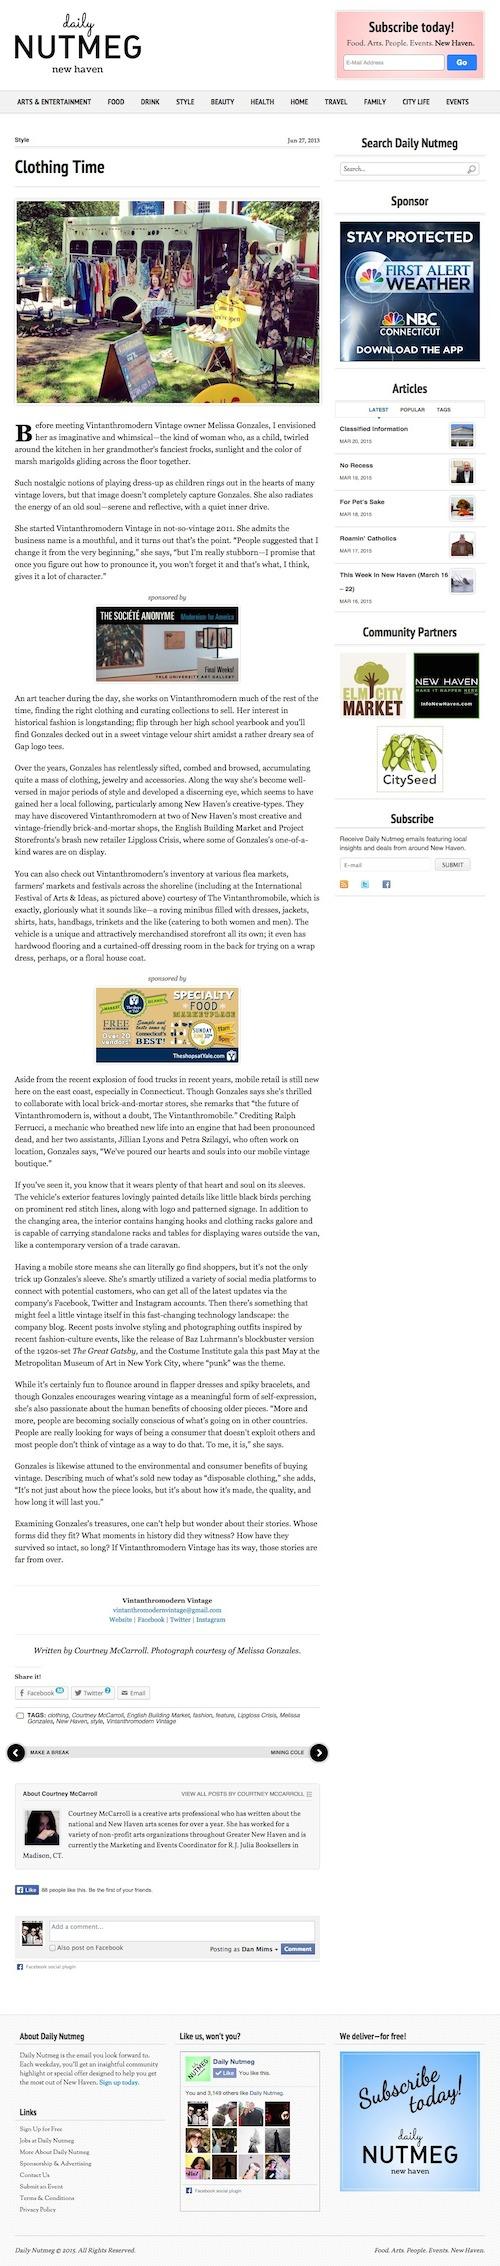 Vintanthromodern_DailyNutmeg_press_2013-6-27_500